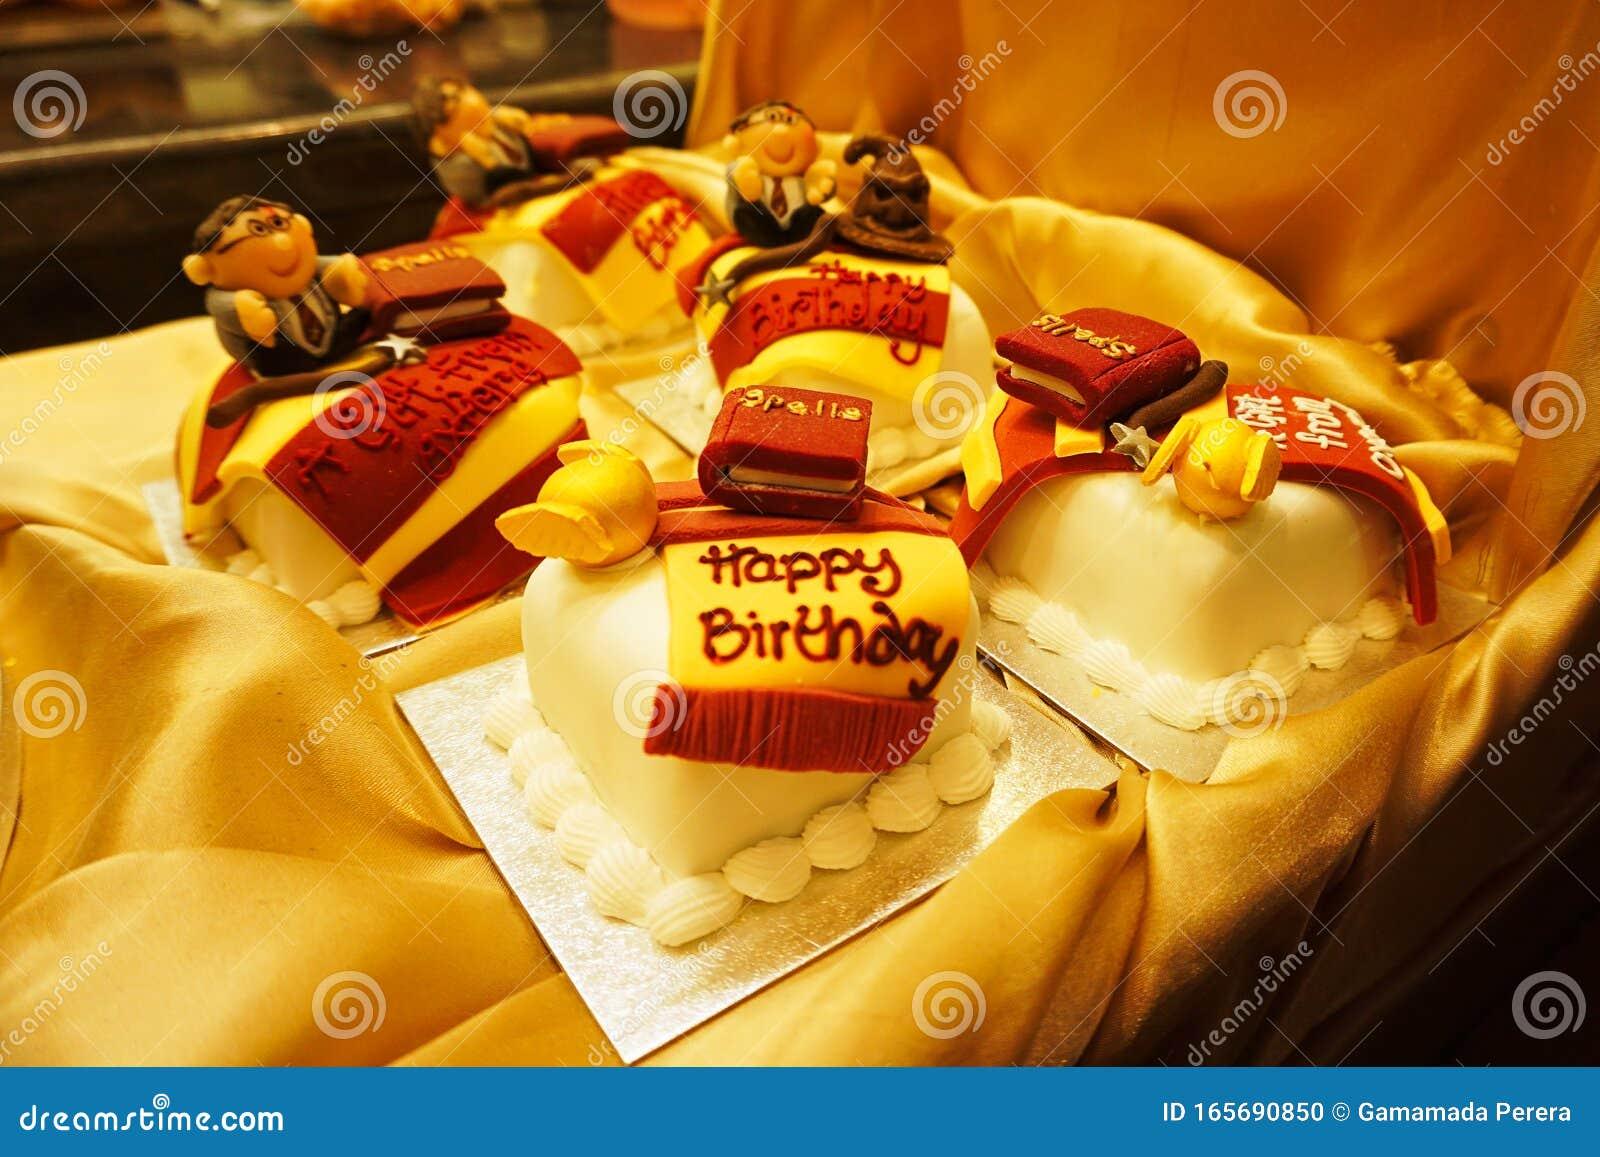 Peachy Harry Potter Wizards Happy Birthday Mini Cakes Editorial Image Funny Birthday Cards Online Inifofree Goldxyz